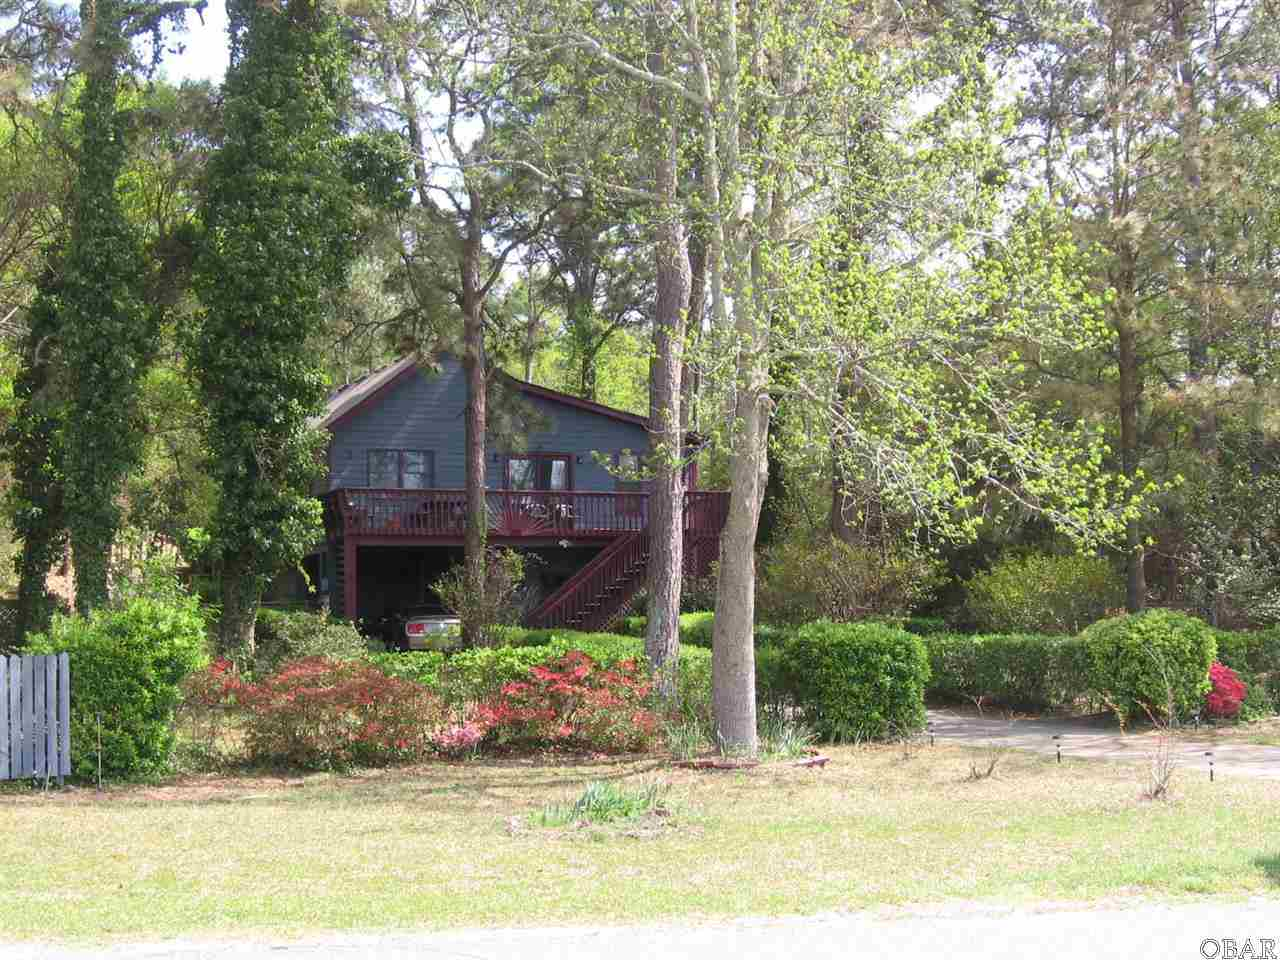 427 Harbour View Drive,Kill Devil Hills,NC 27948,3 Bedrooms Bedrooms,2 BathroomsBathrooms,Residential,Harbour View Drive,83309